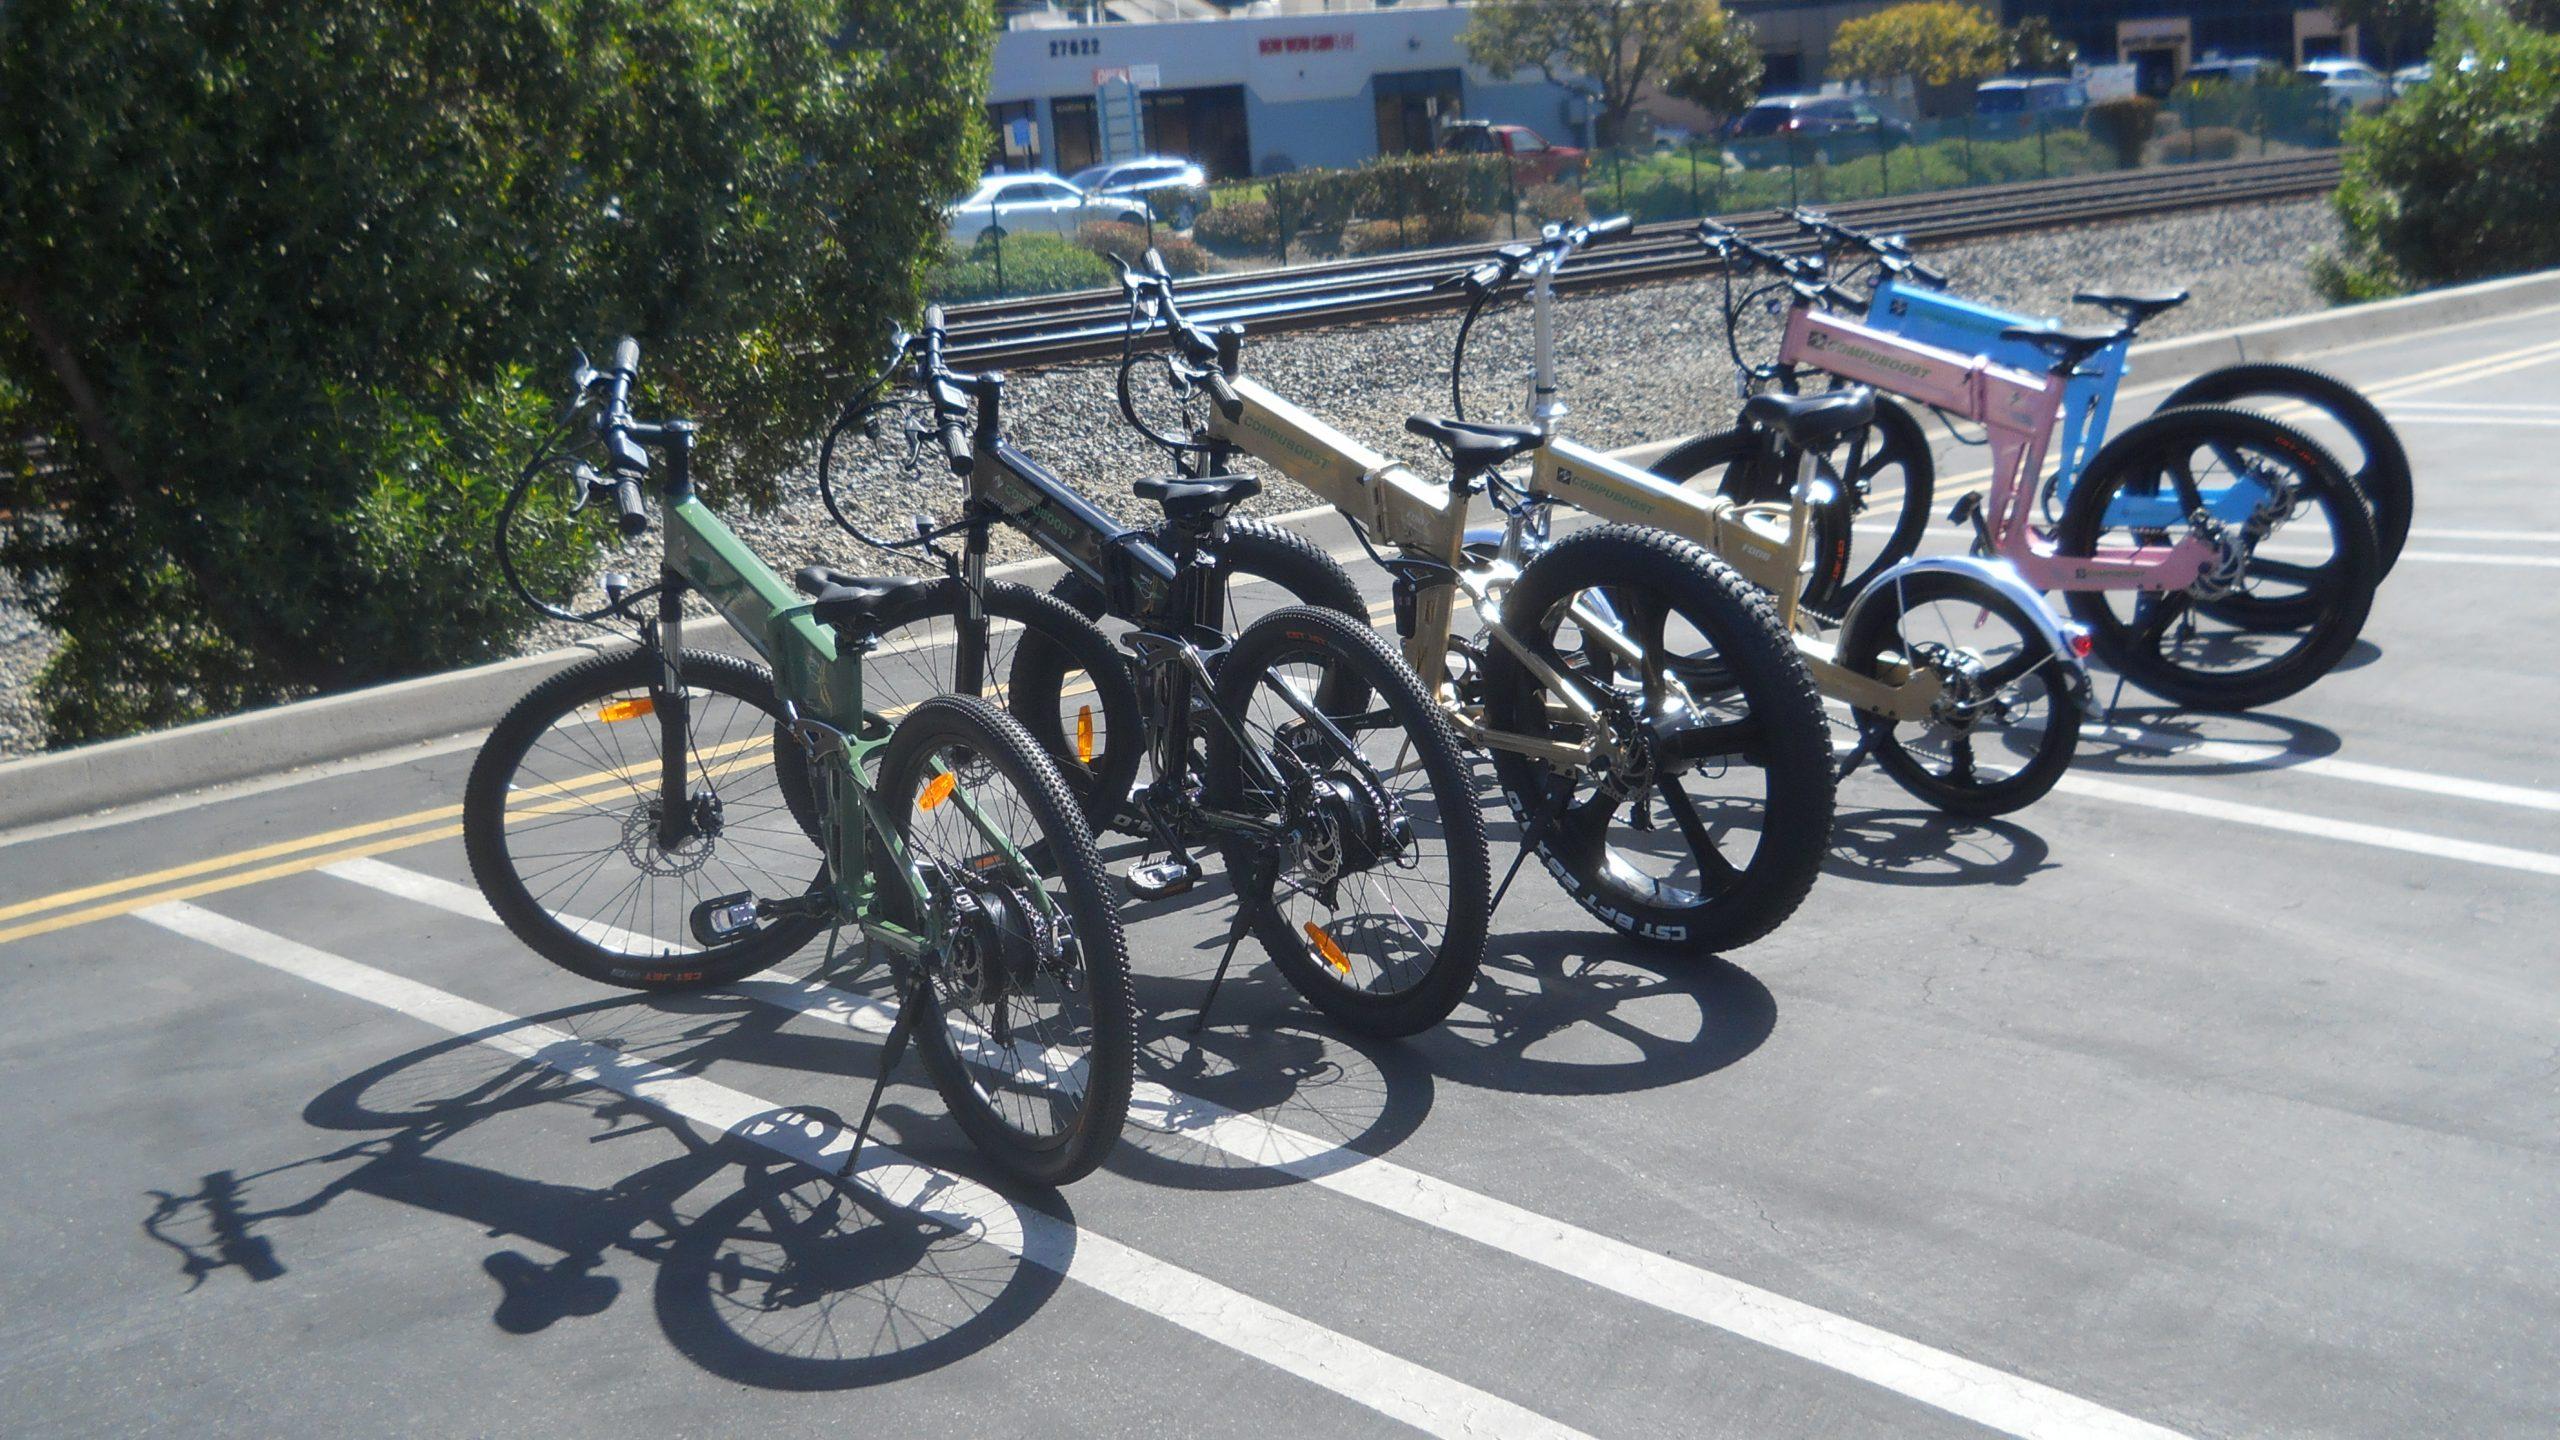 Compuboost Electric Bike Lineup